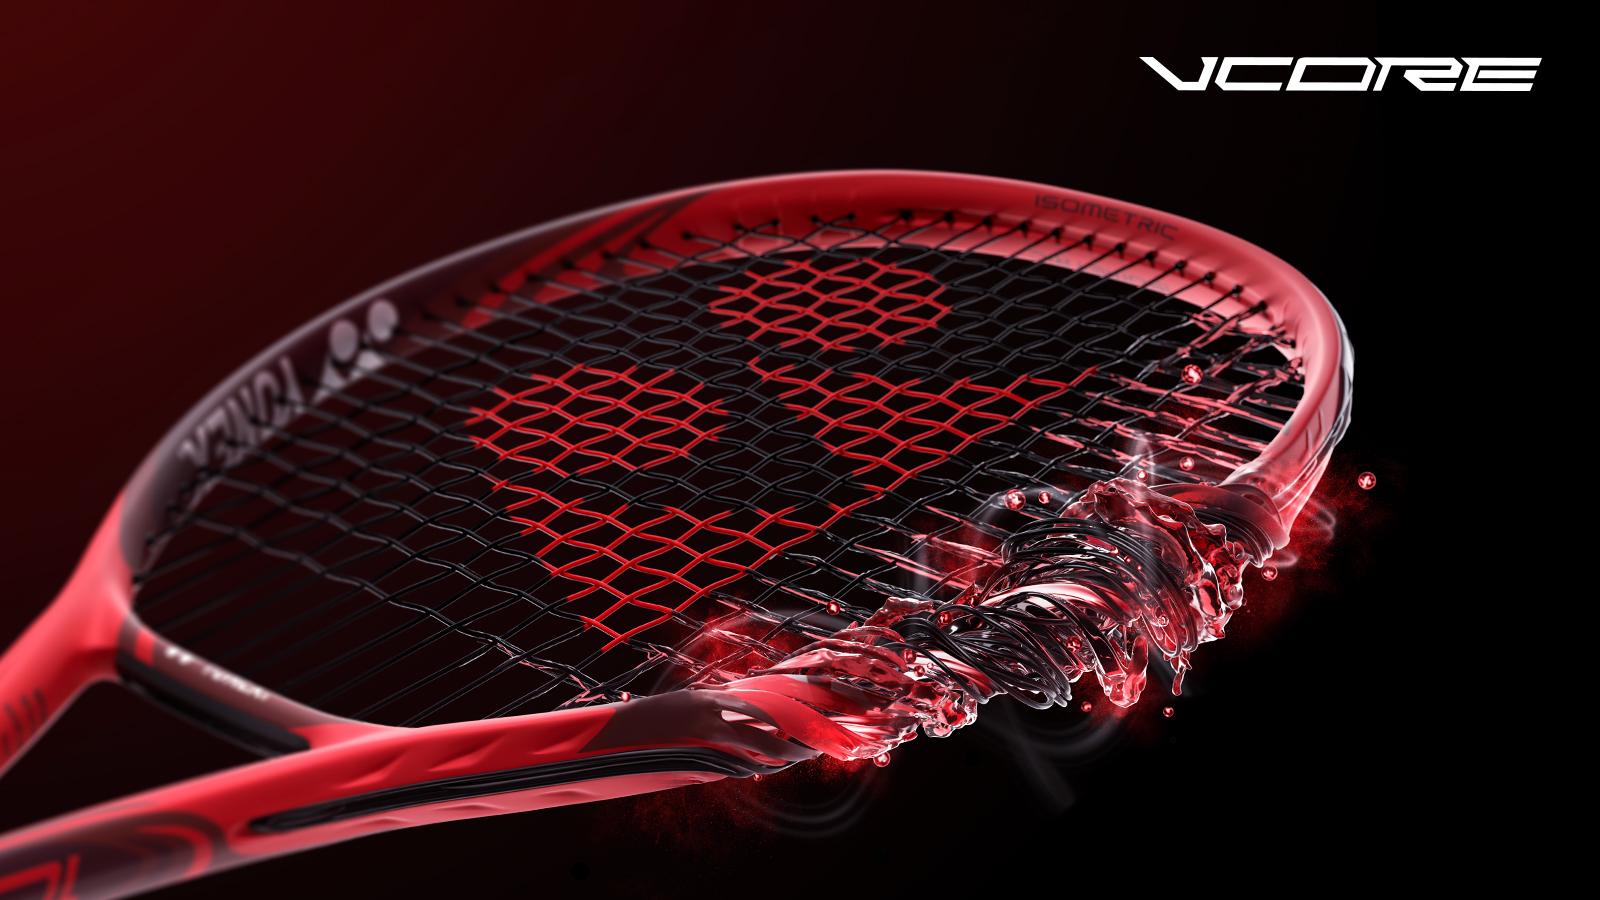 Yonex new VCORE